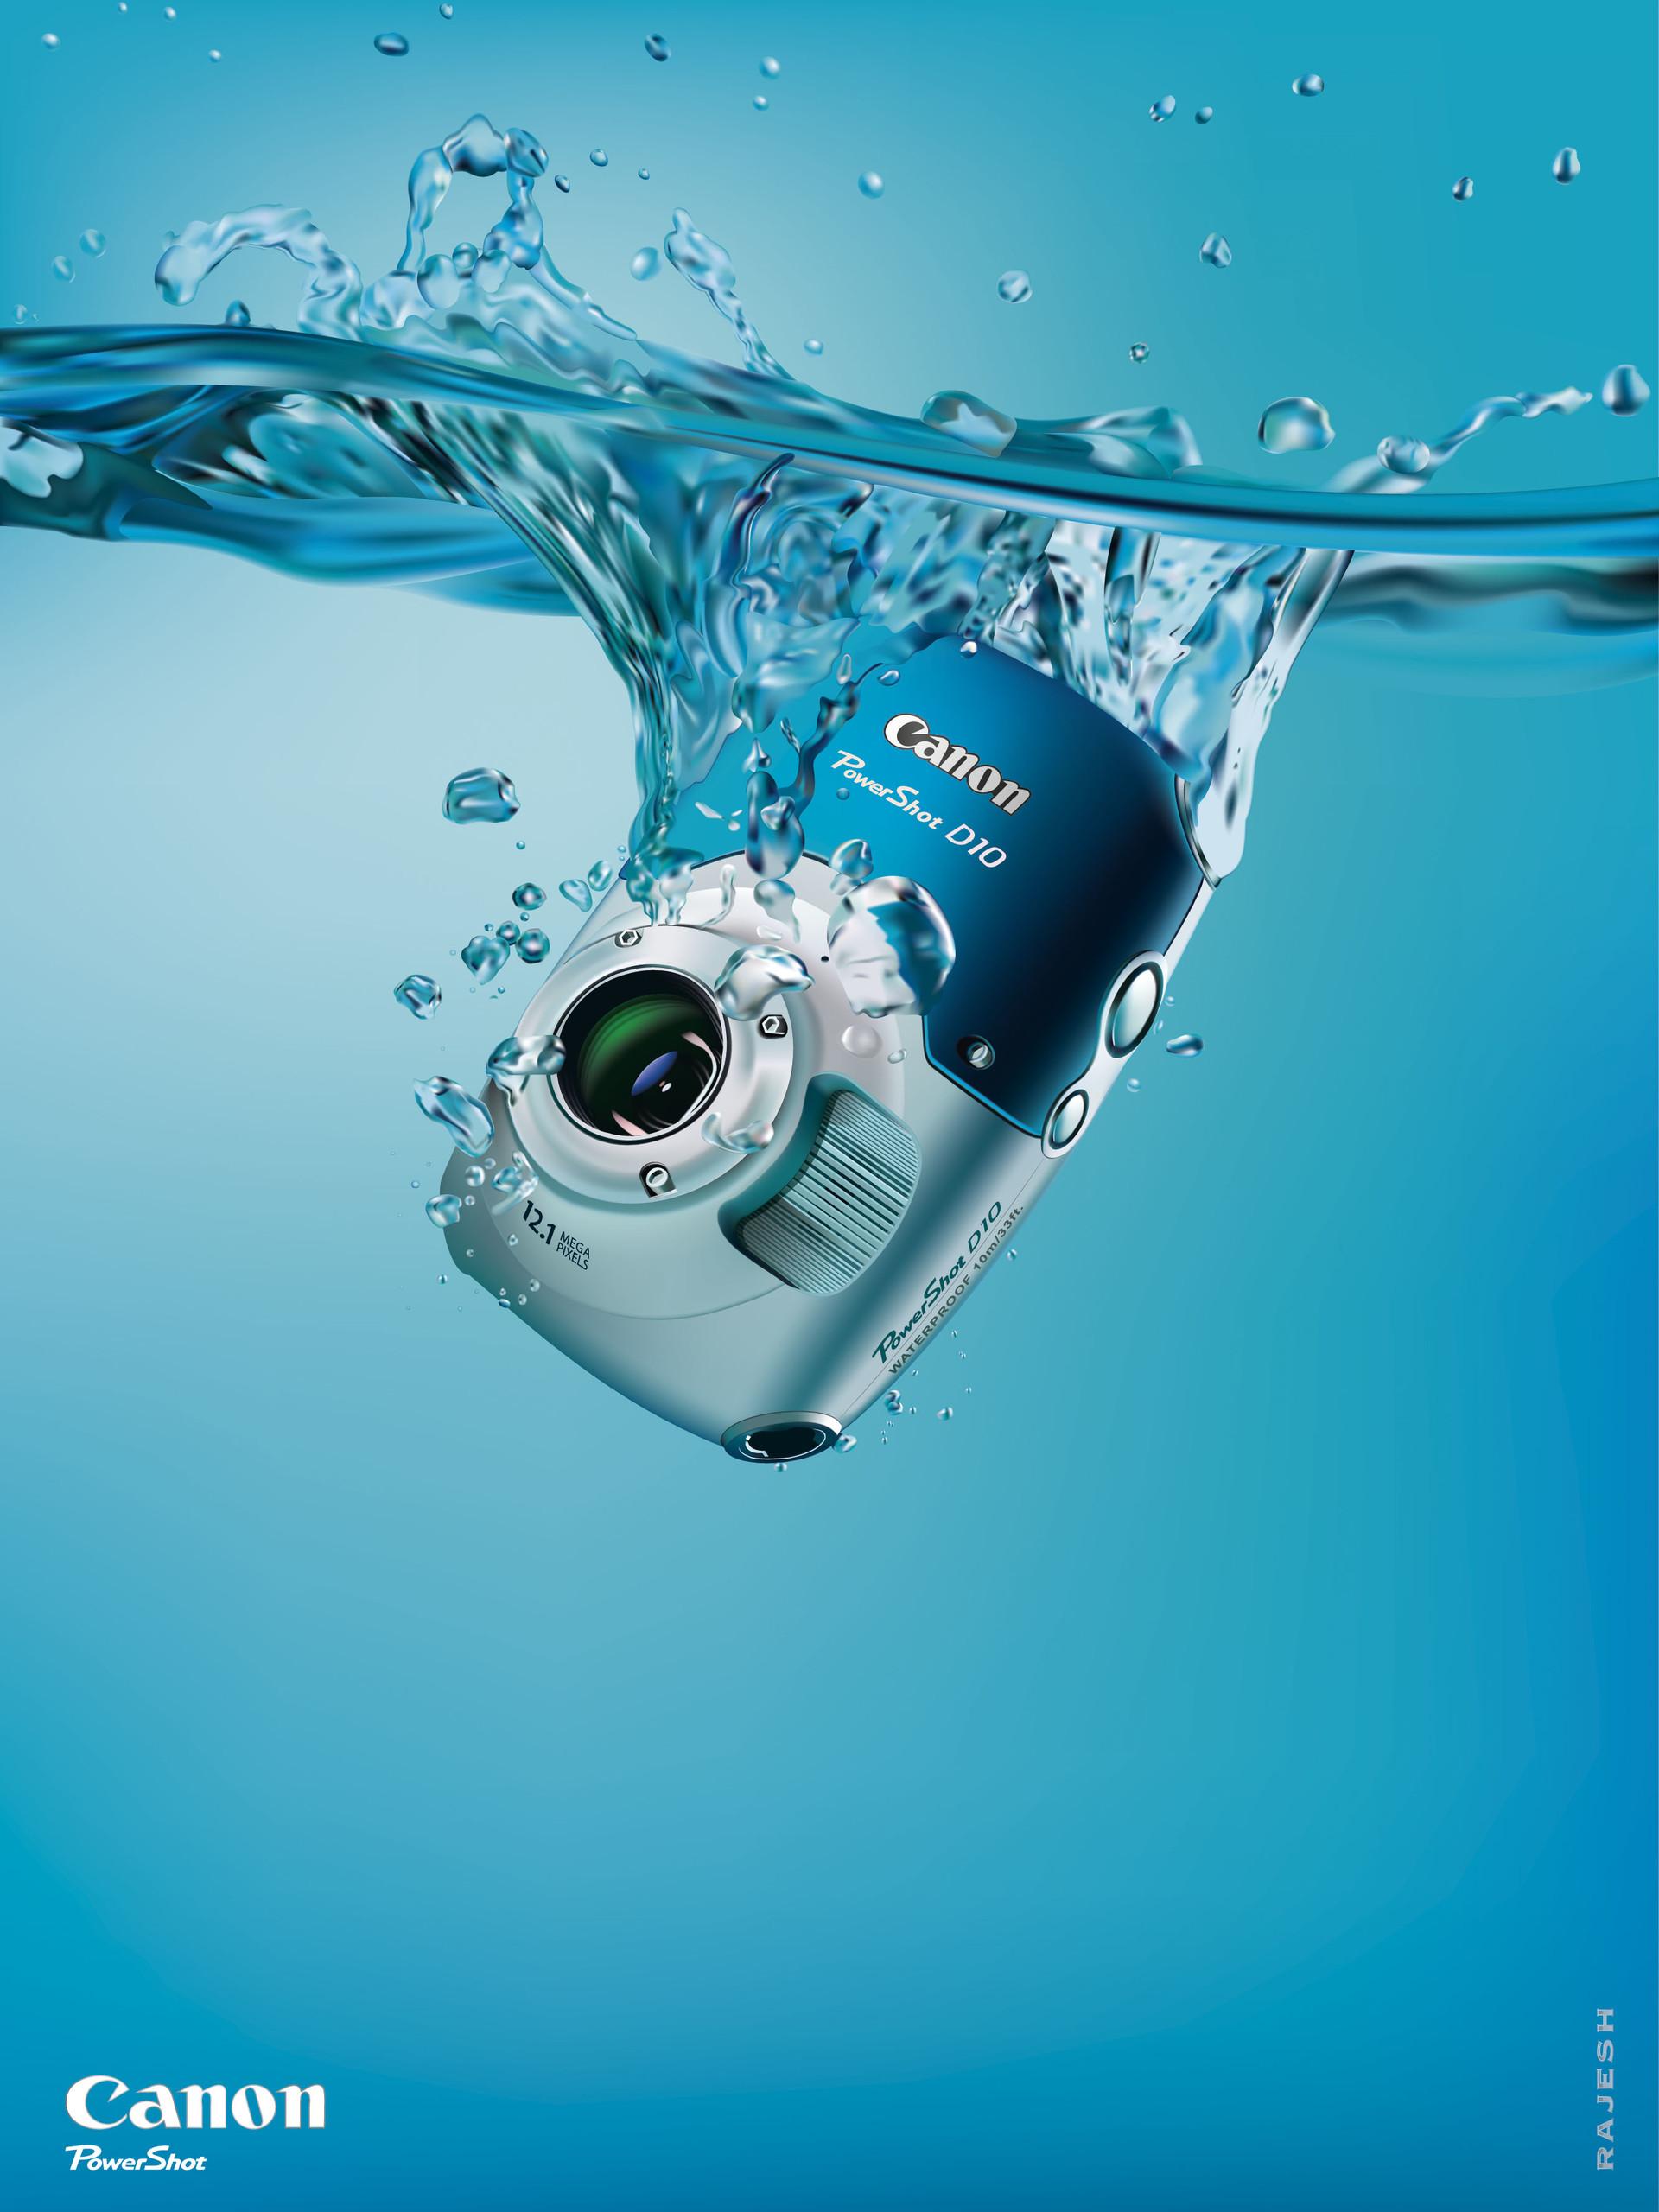 Rajesh sawant camera canon